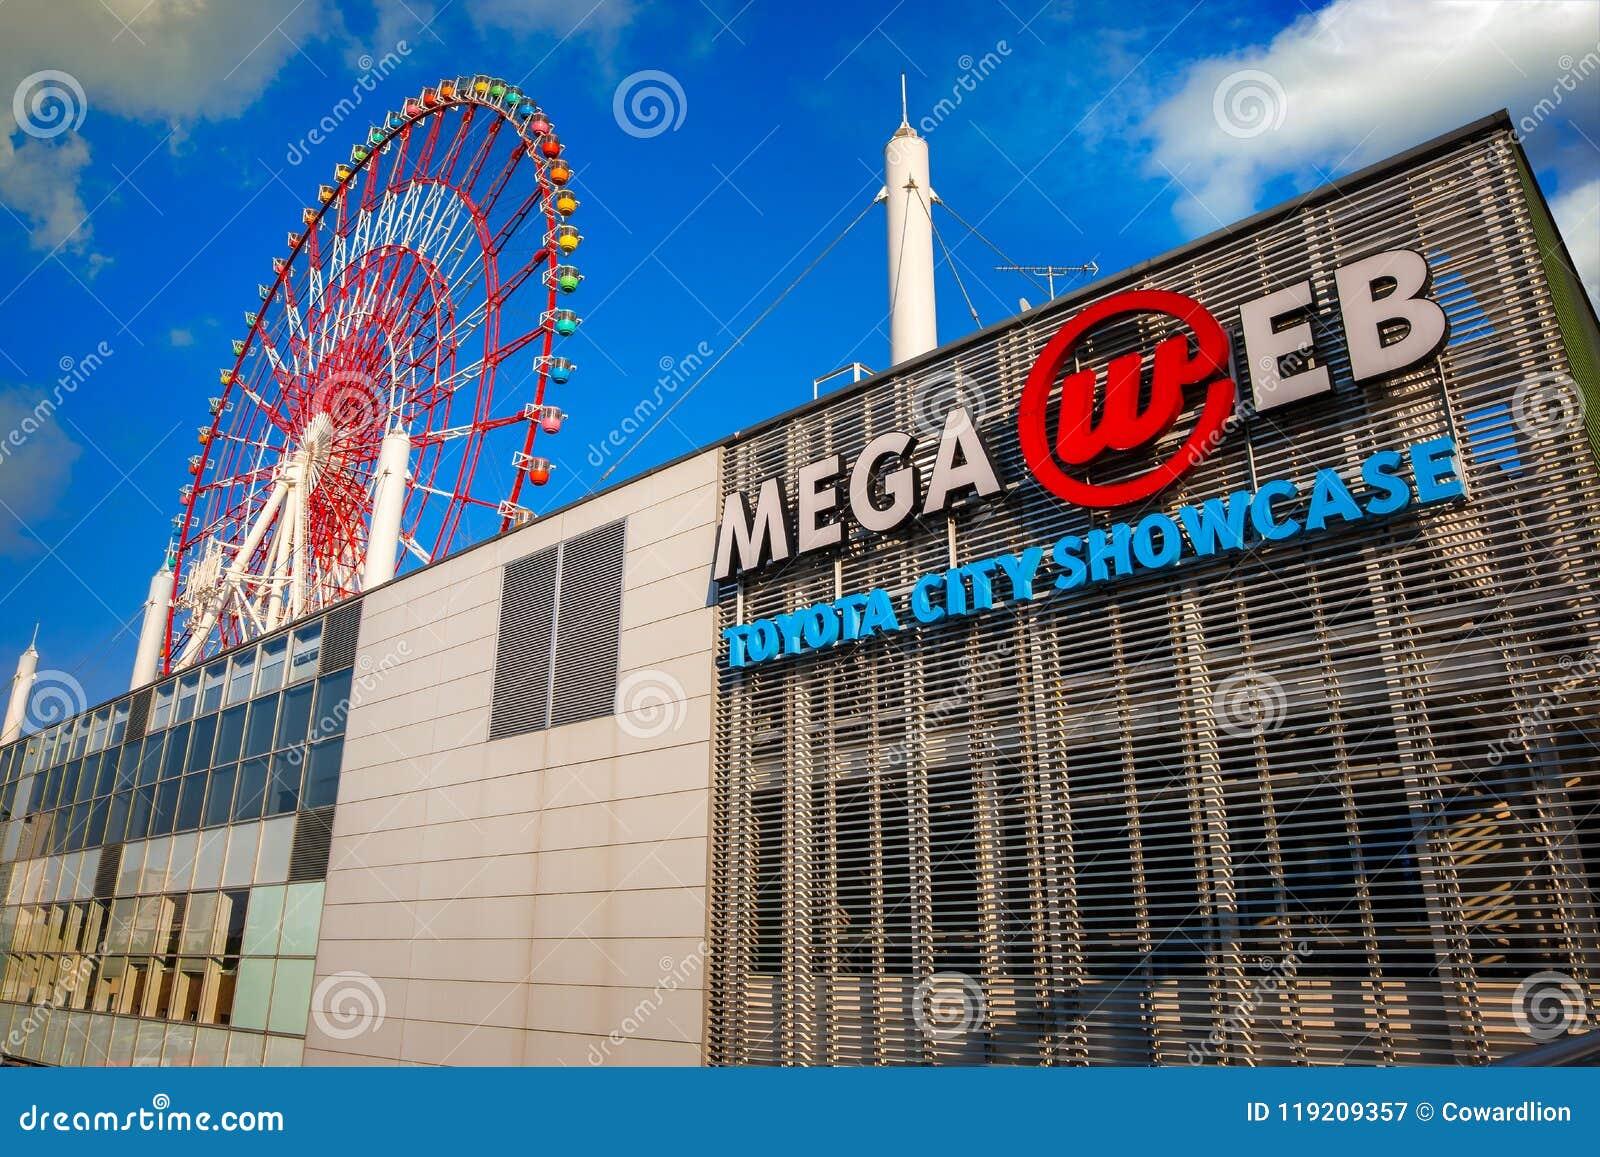 Toyoya Mega Web In Odaiba, Tokyo, Japan Editorial Photography